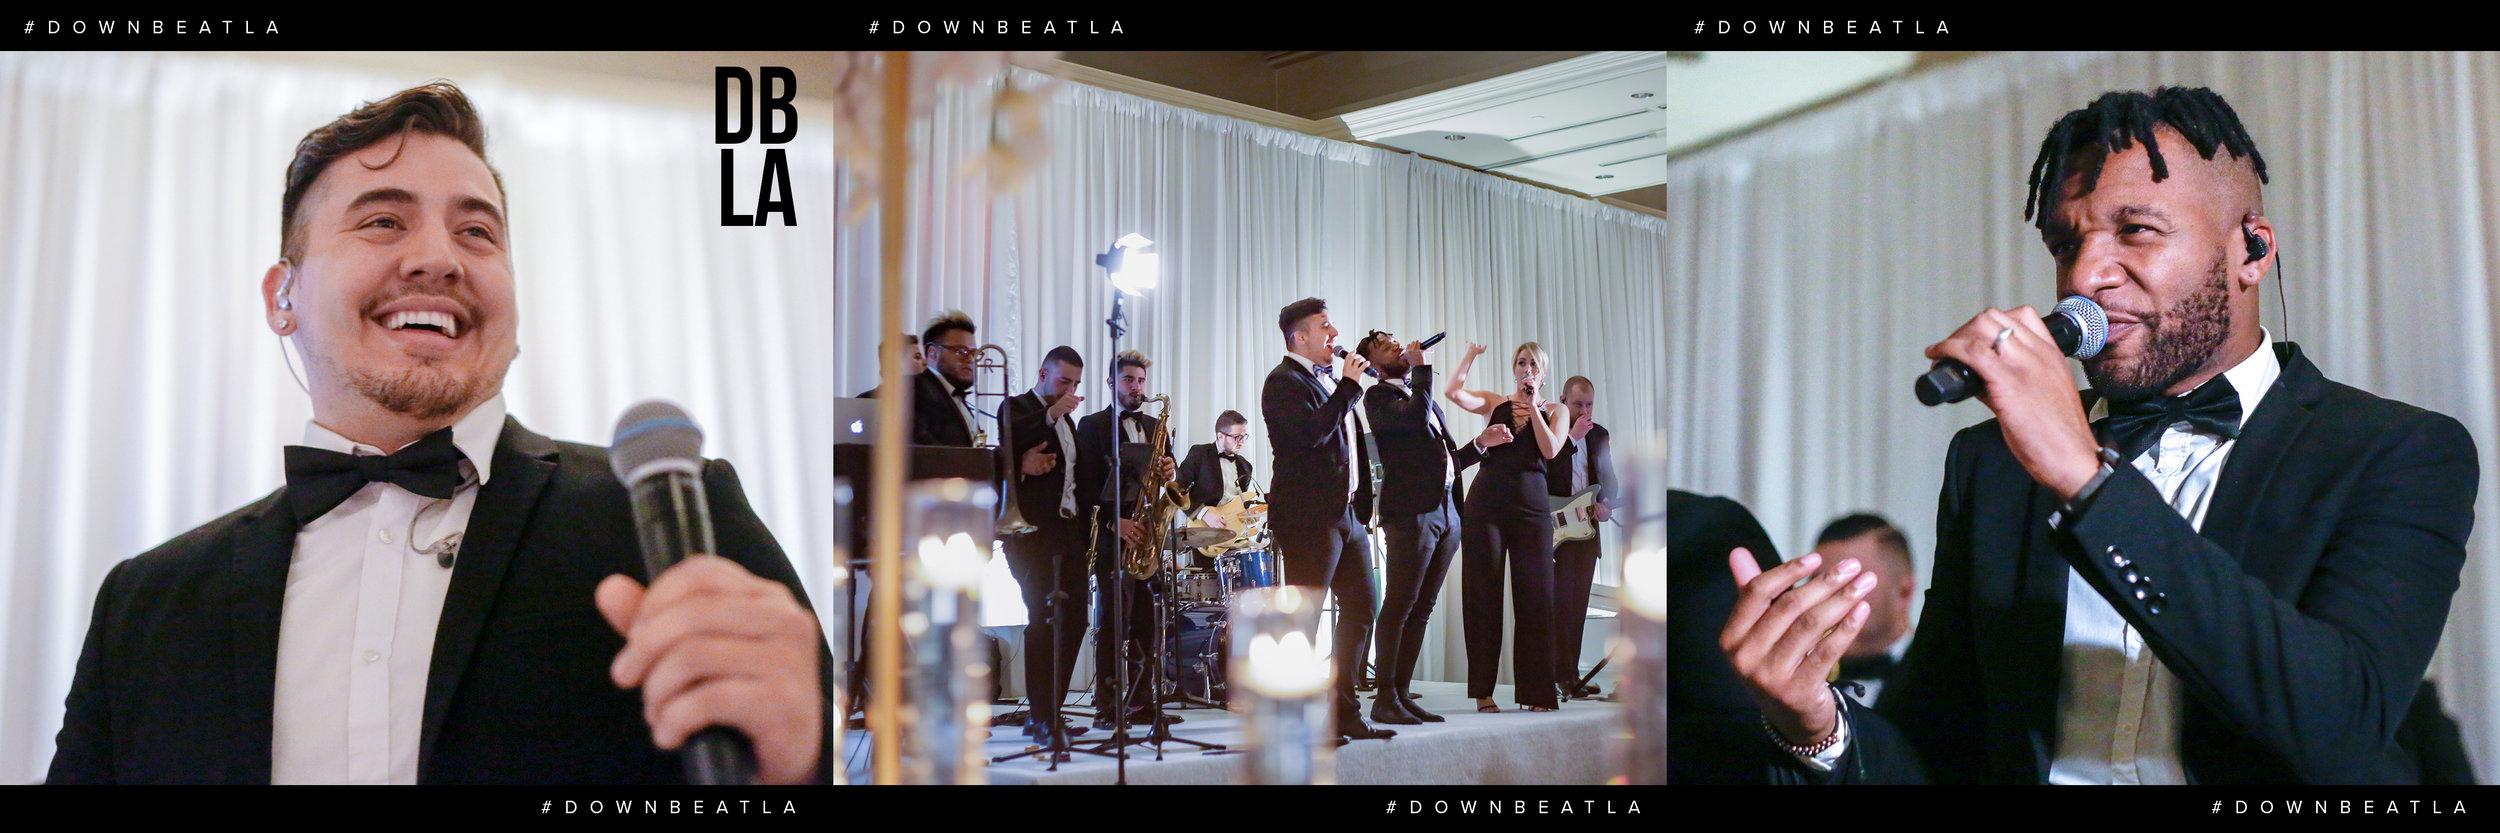 Gold Standard Downbeat LA Ritz-Carlton, Laguna Niguel Wedding Band